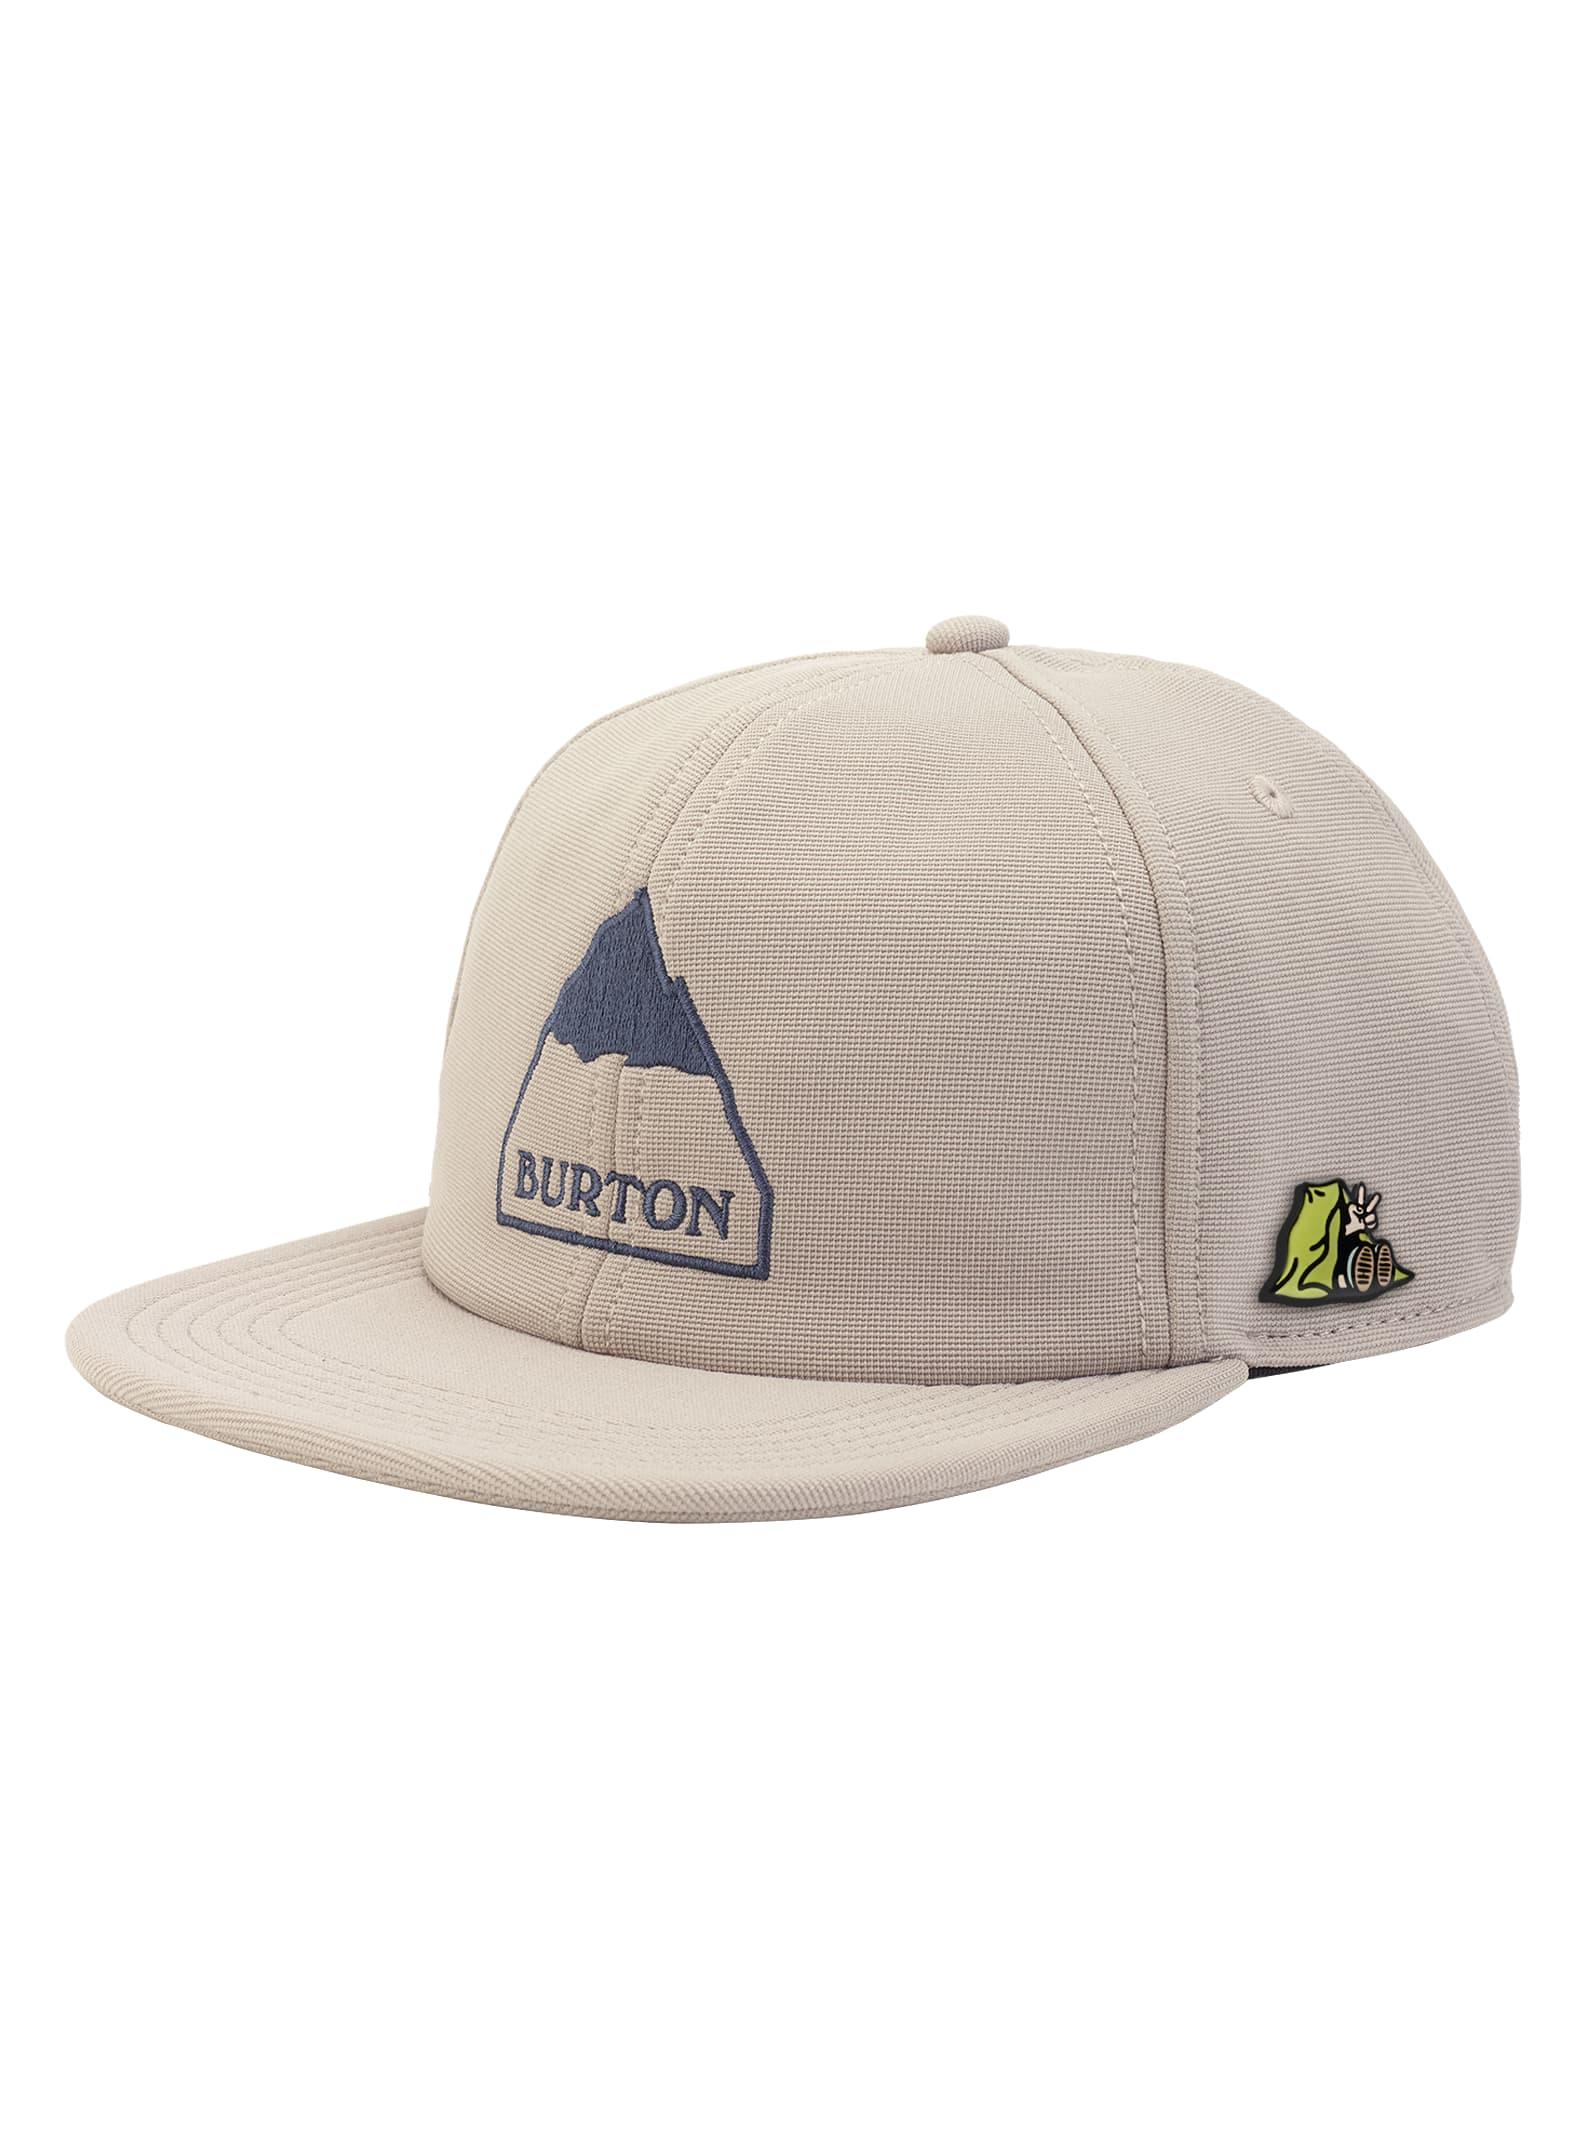 6e4cc649fc65f Men s Hats   Beanies